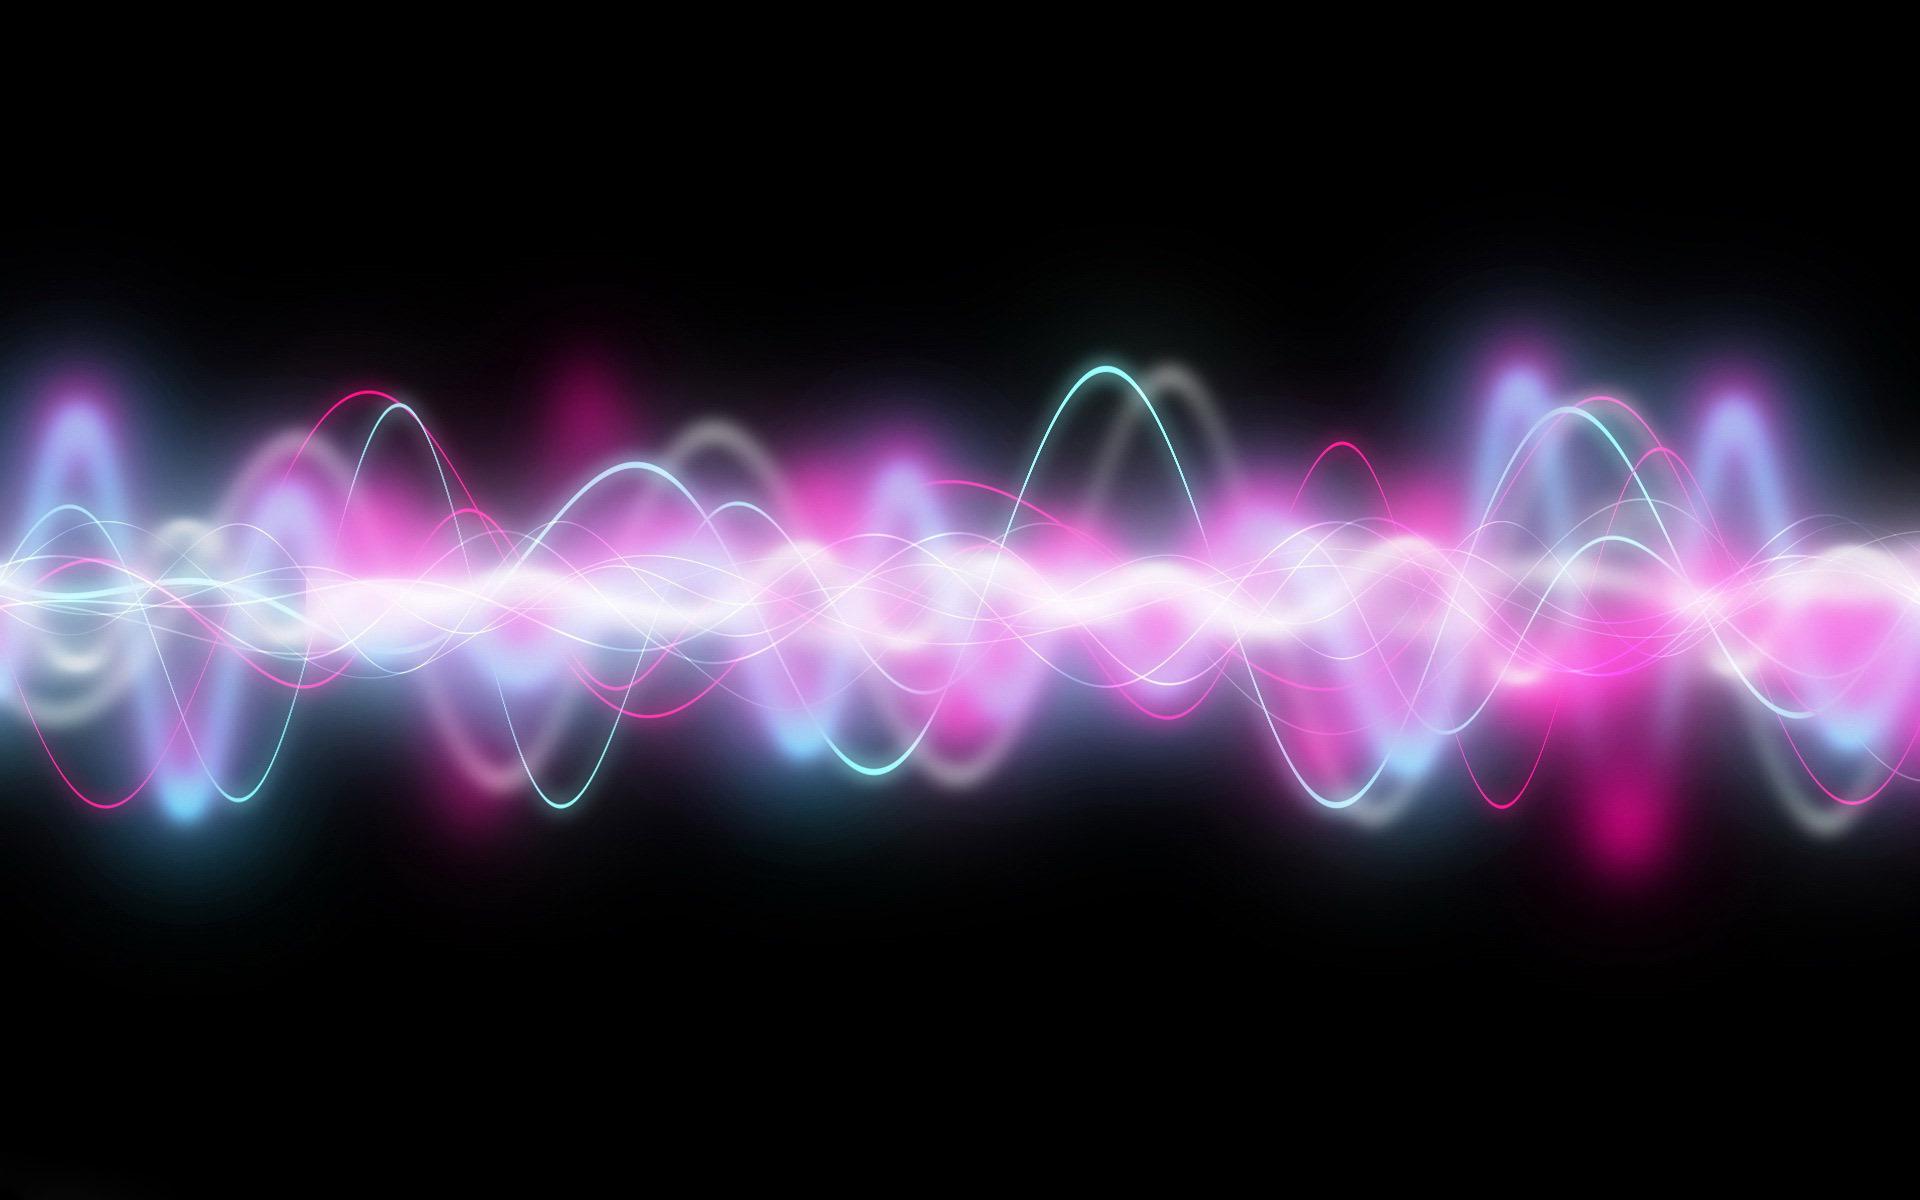 Sound Wave Wallpaper images 1920x1200